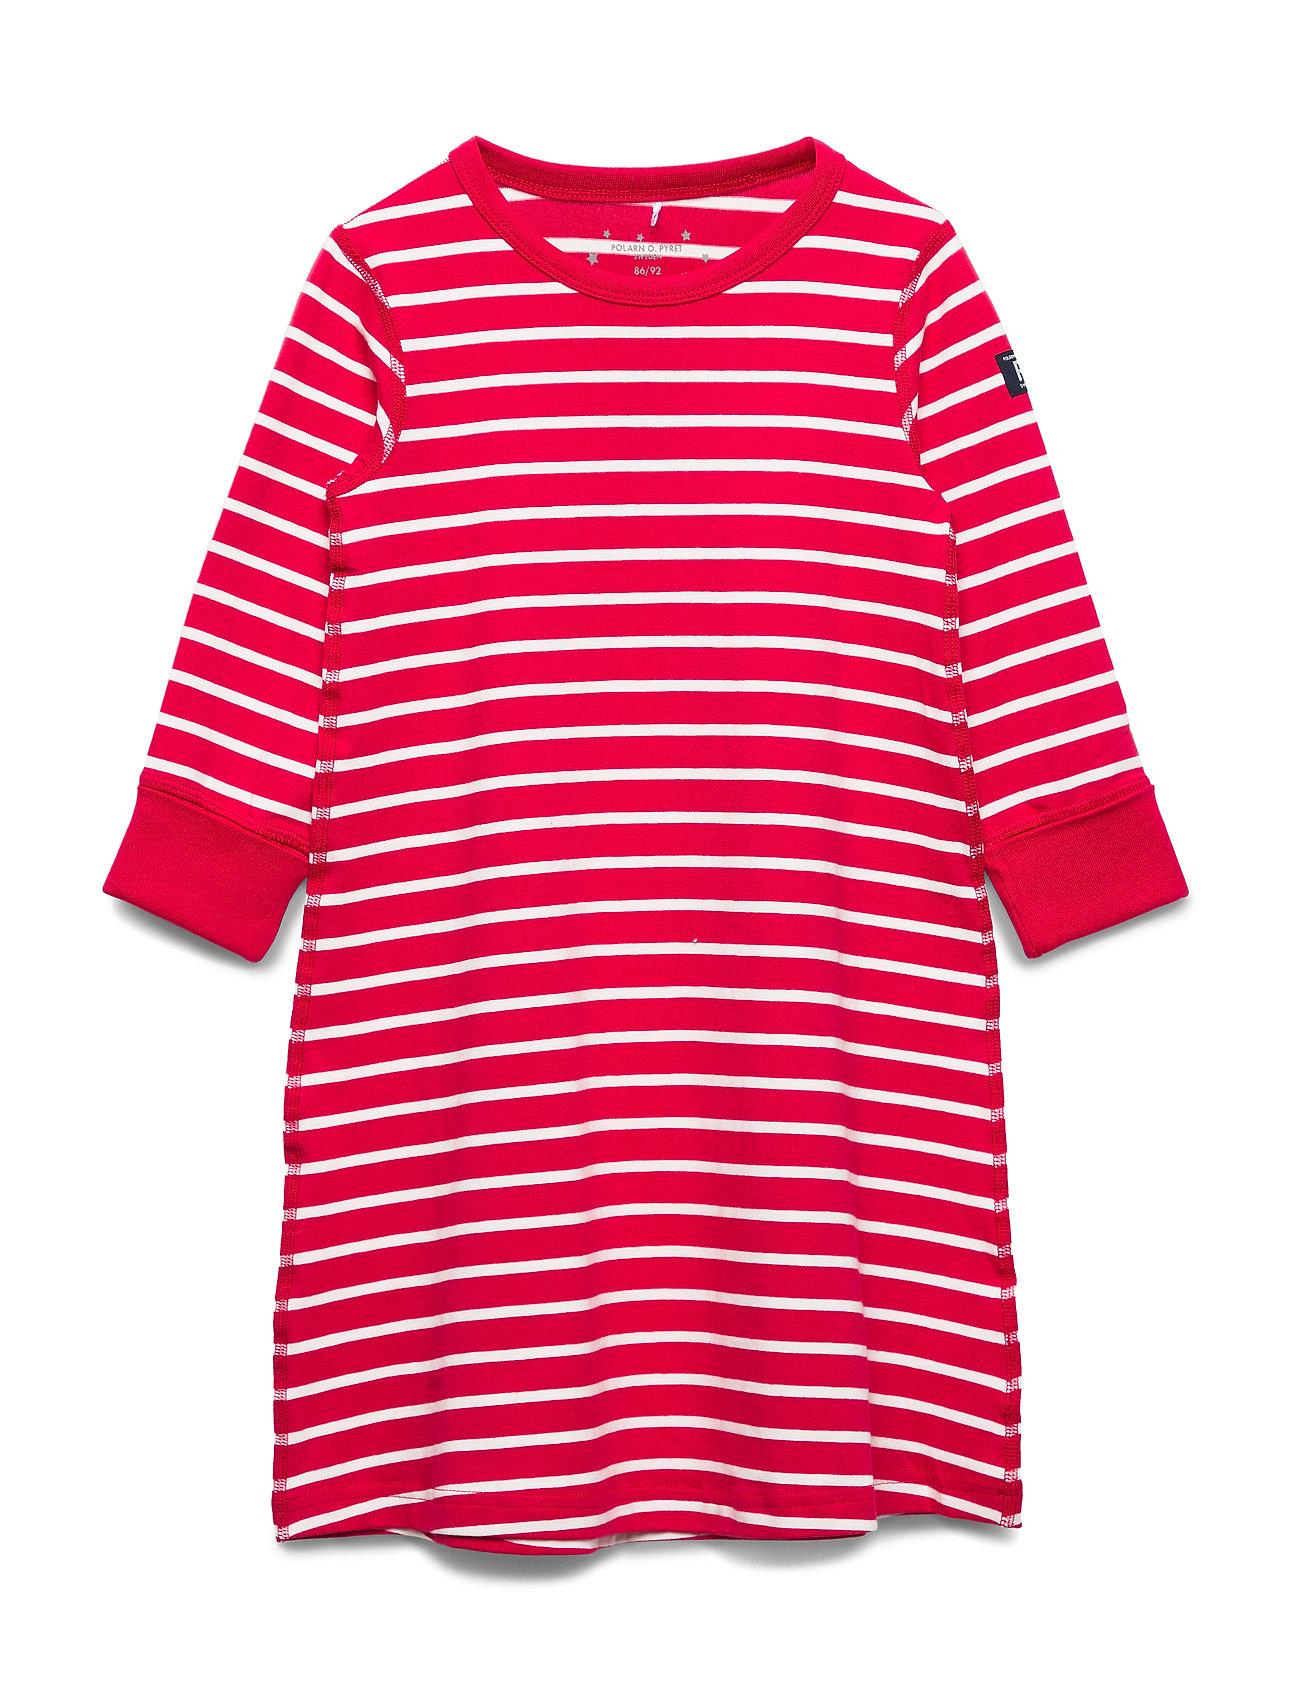 Polarn O. Pyret Nightdress L/S Striped Preschool - SKI PATROL